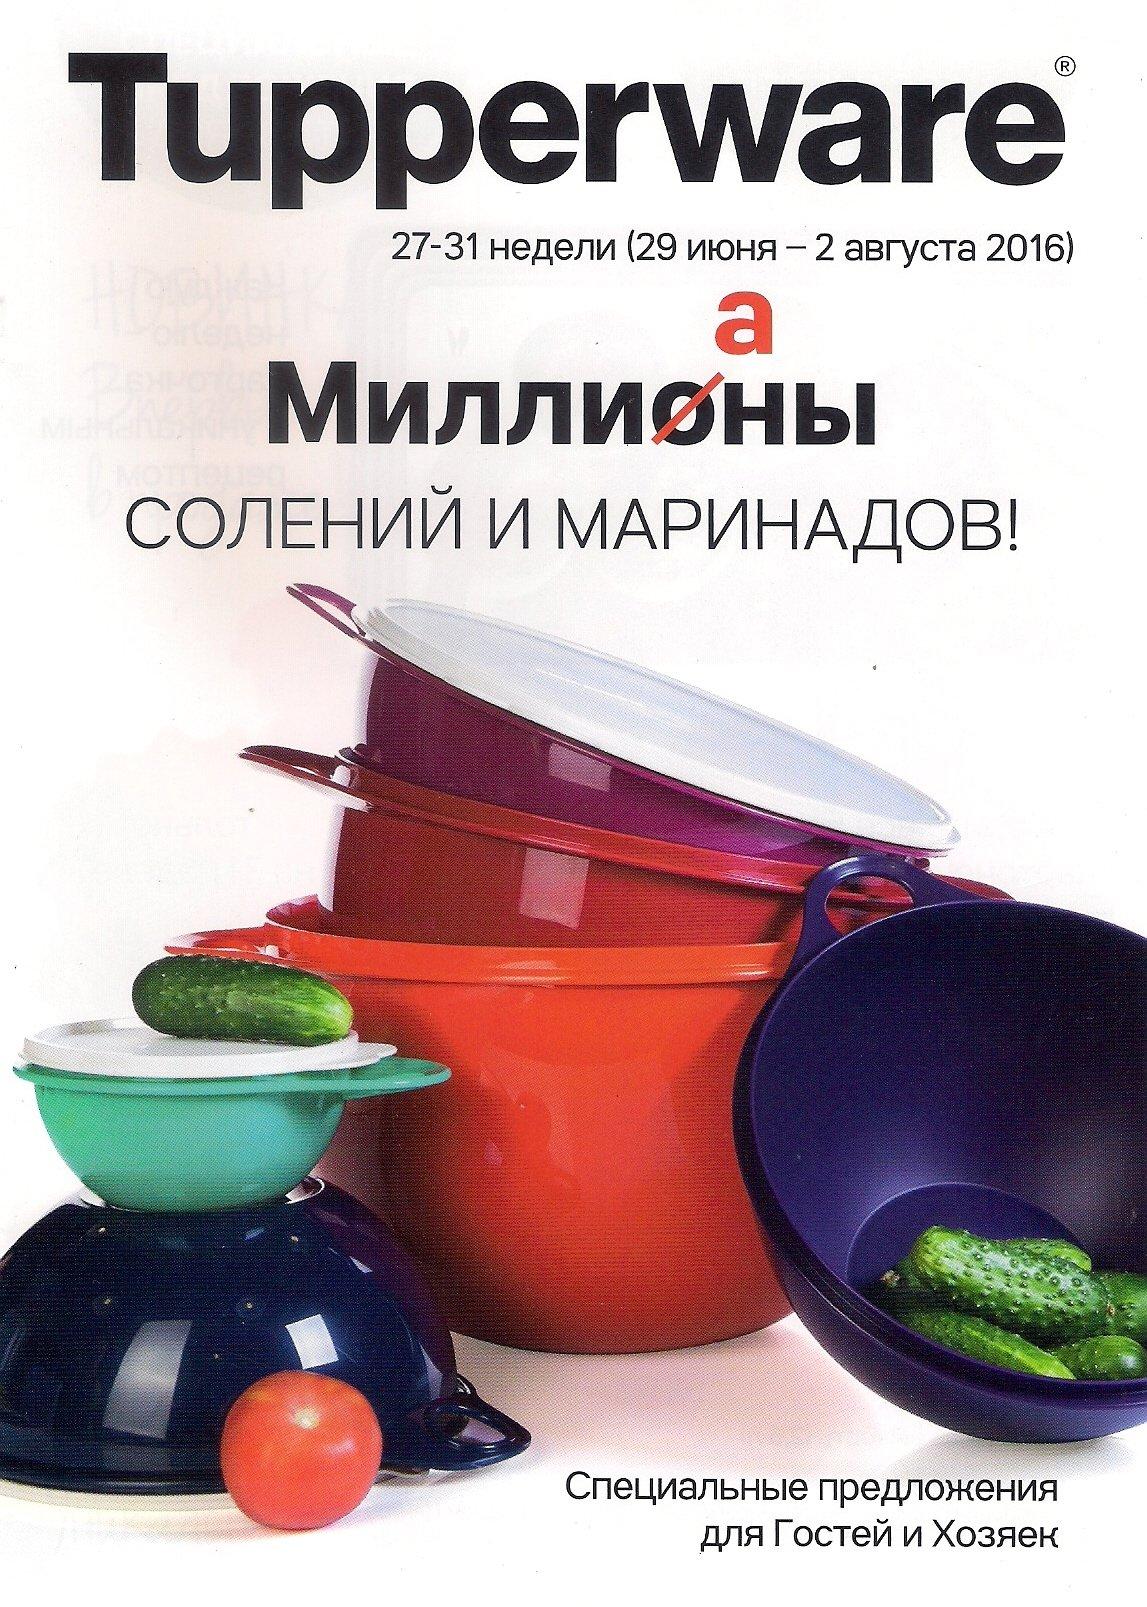 https://tupperware-online.ru/images/upload/1a.jpg